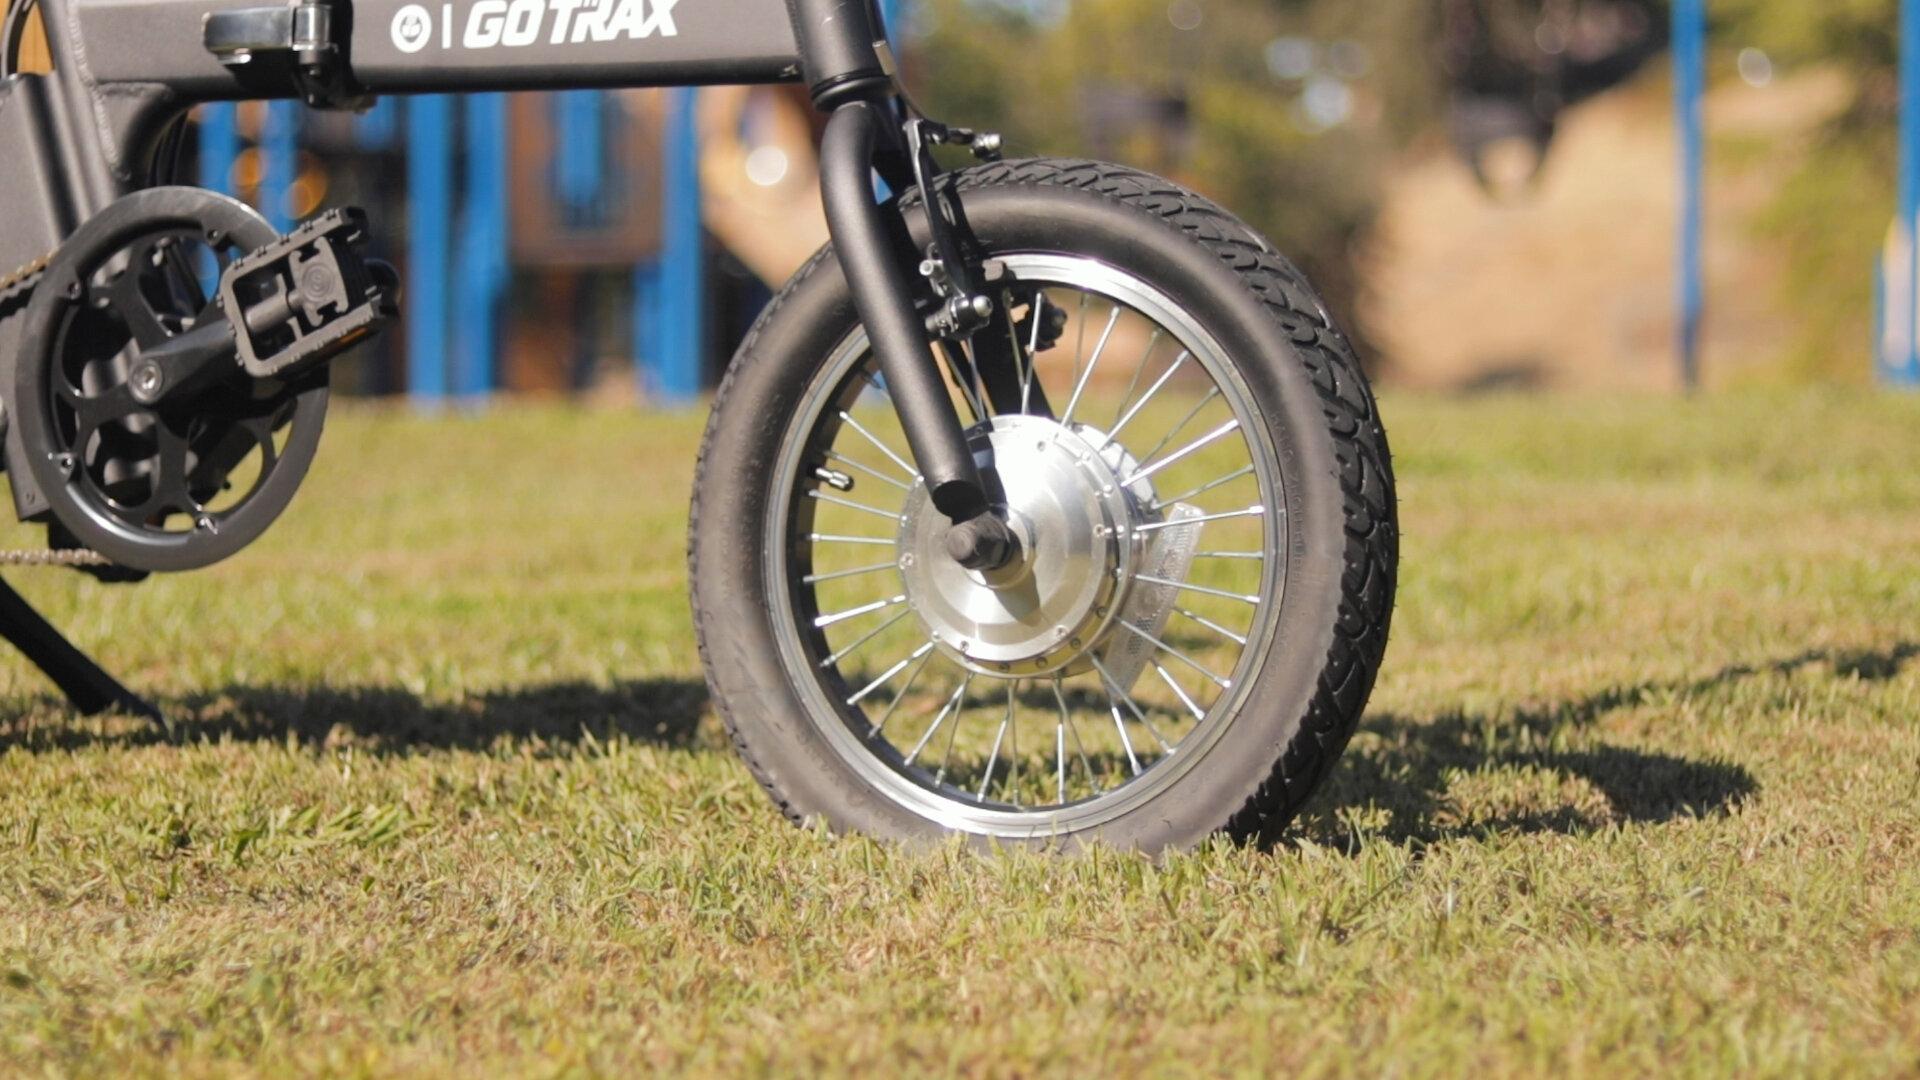 gotrax-shift-s1-electric-bike-review-2019-motor-2.jpg